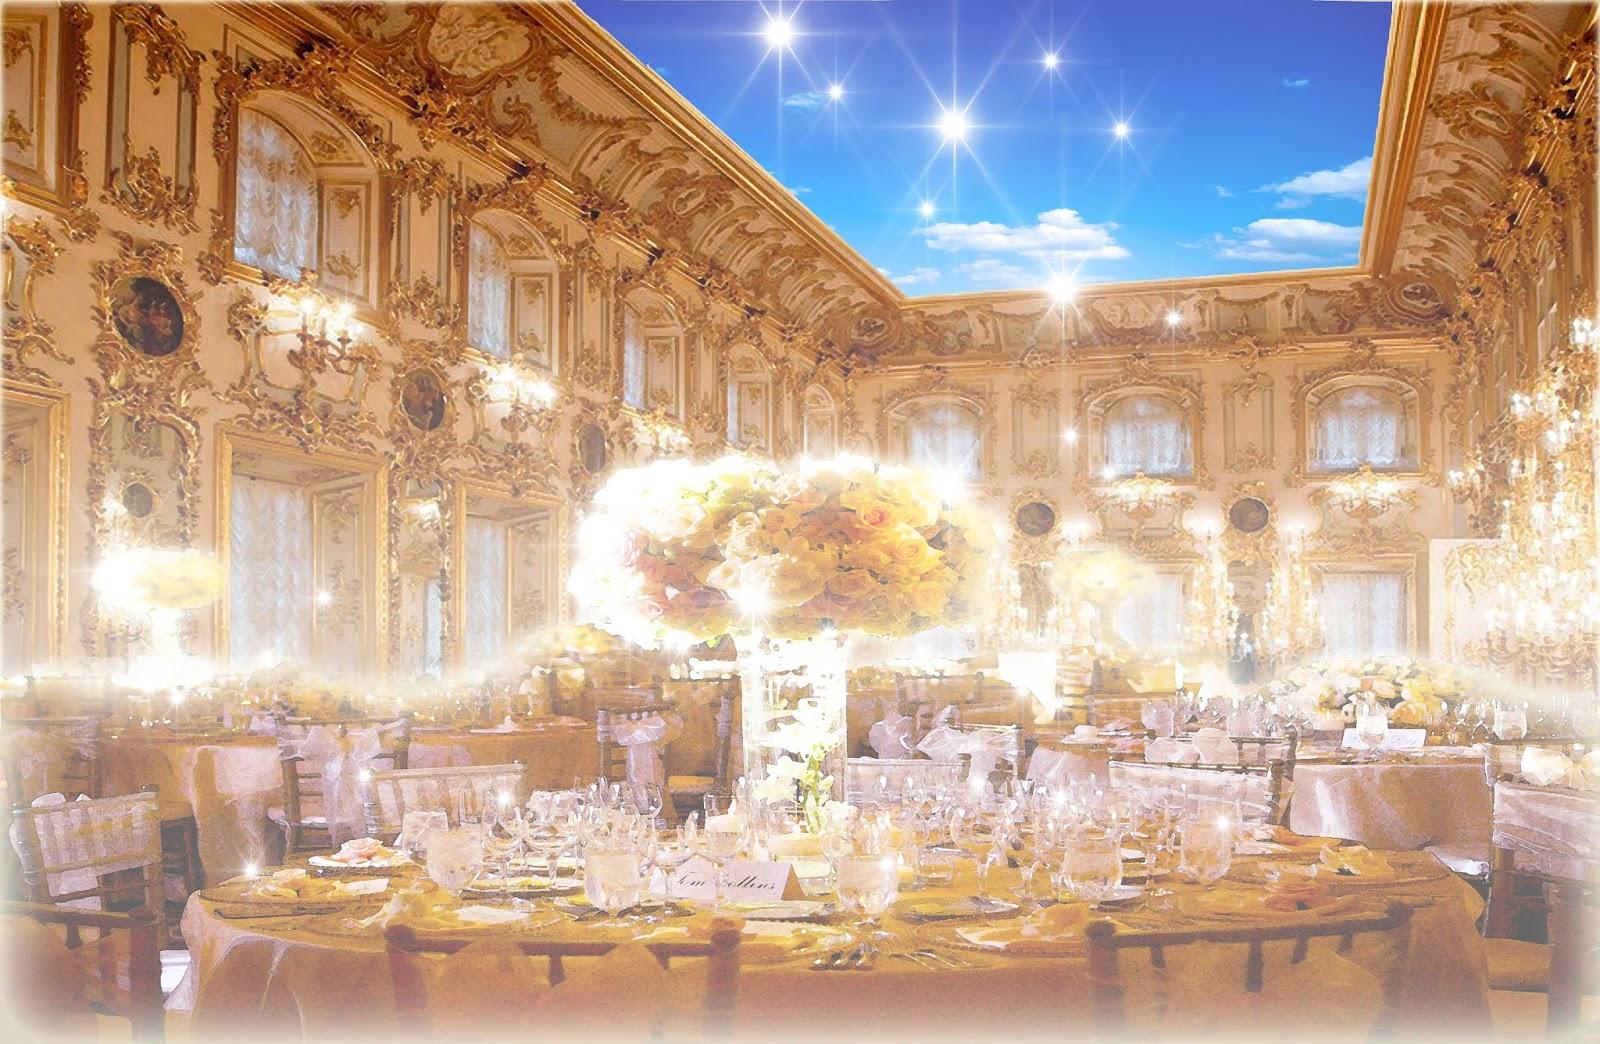 God's Amazing Star Secrets - Part 6